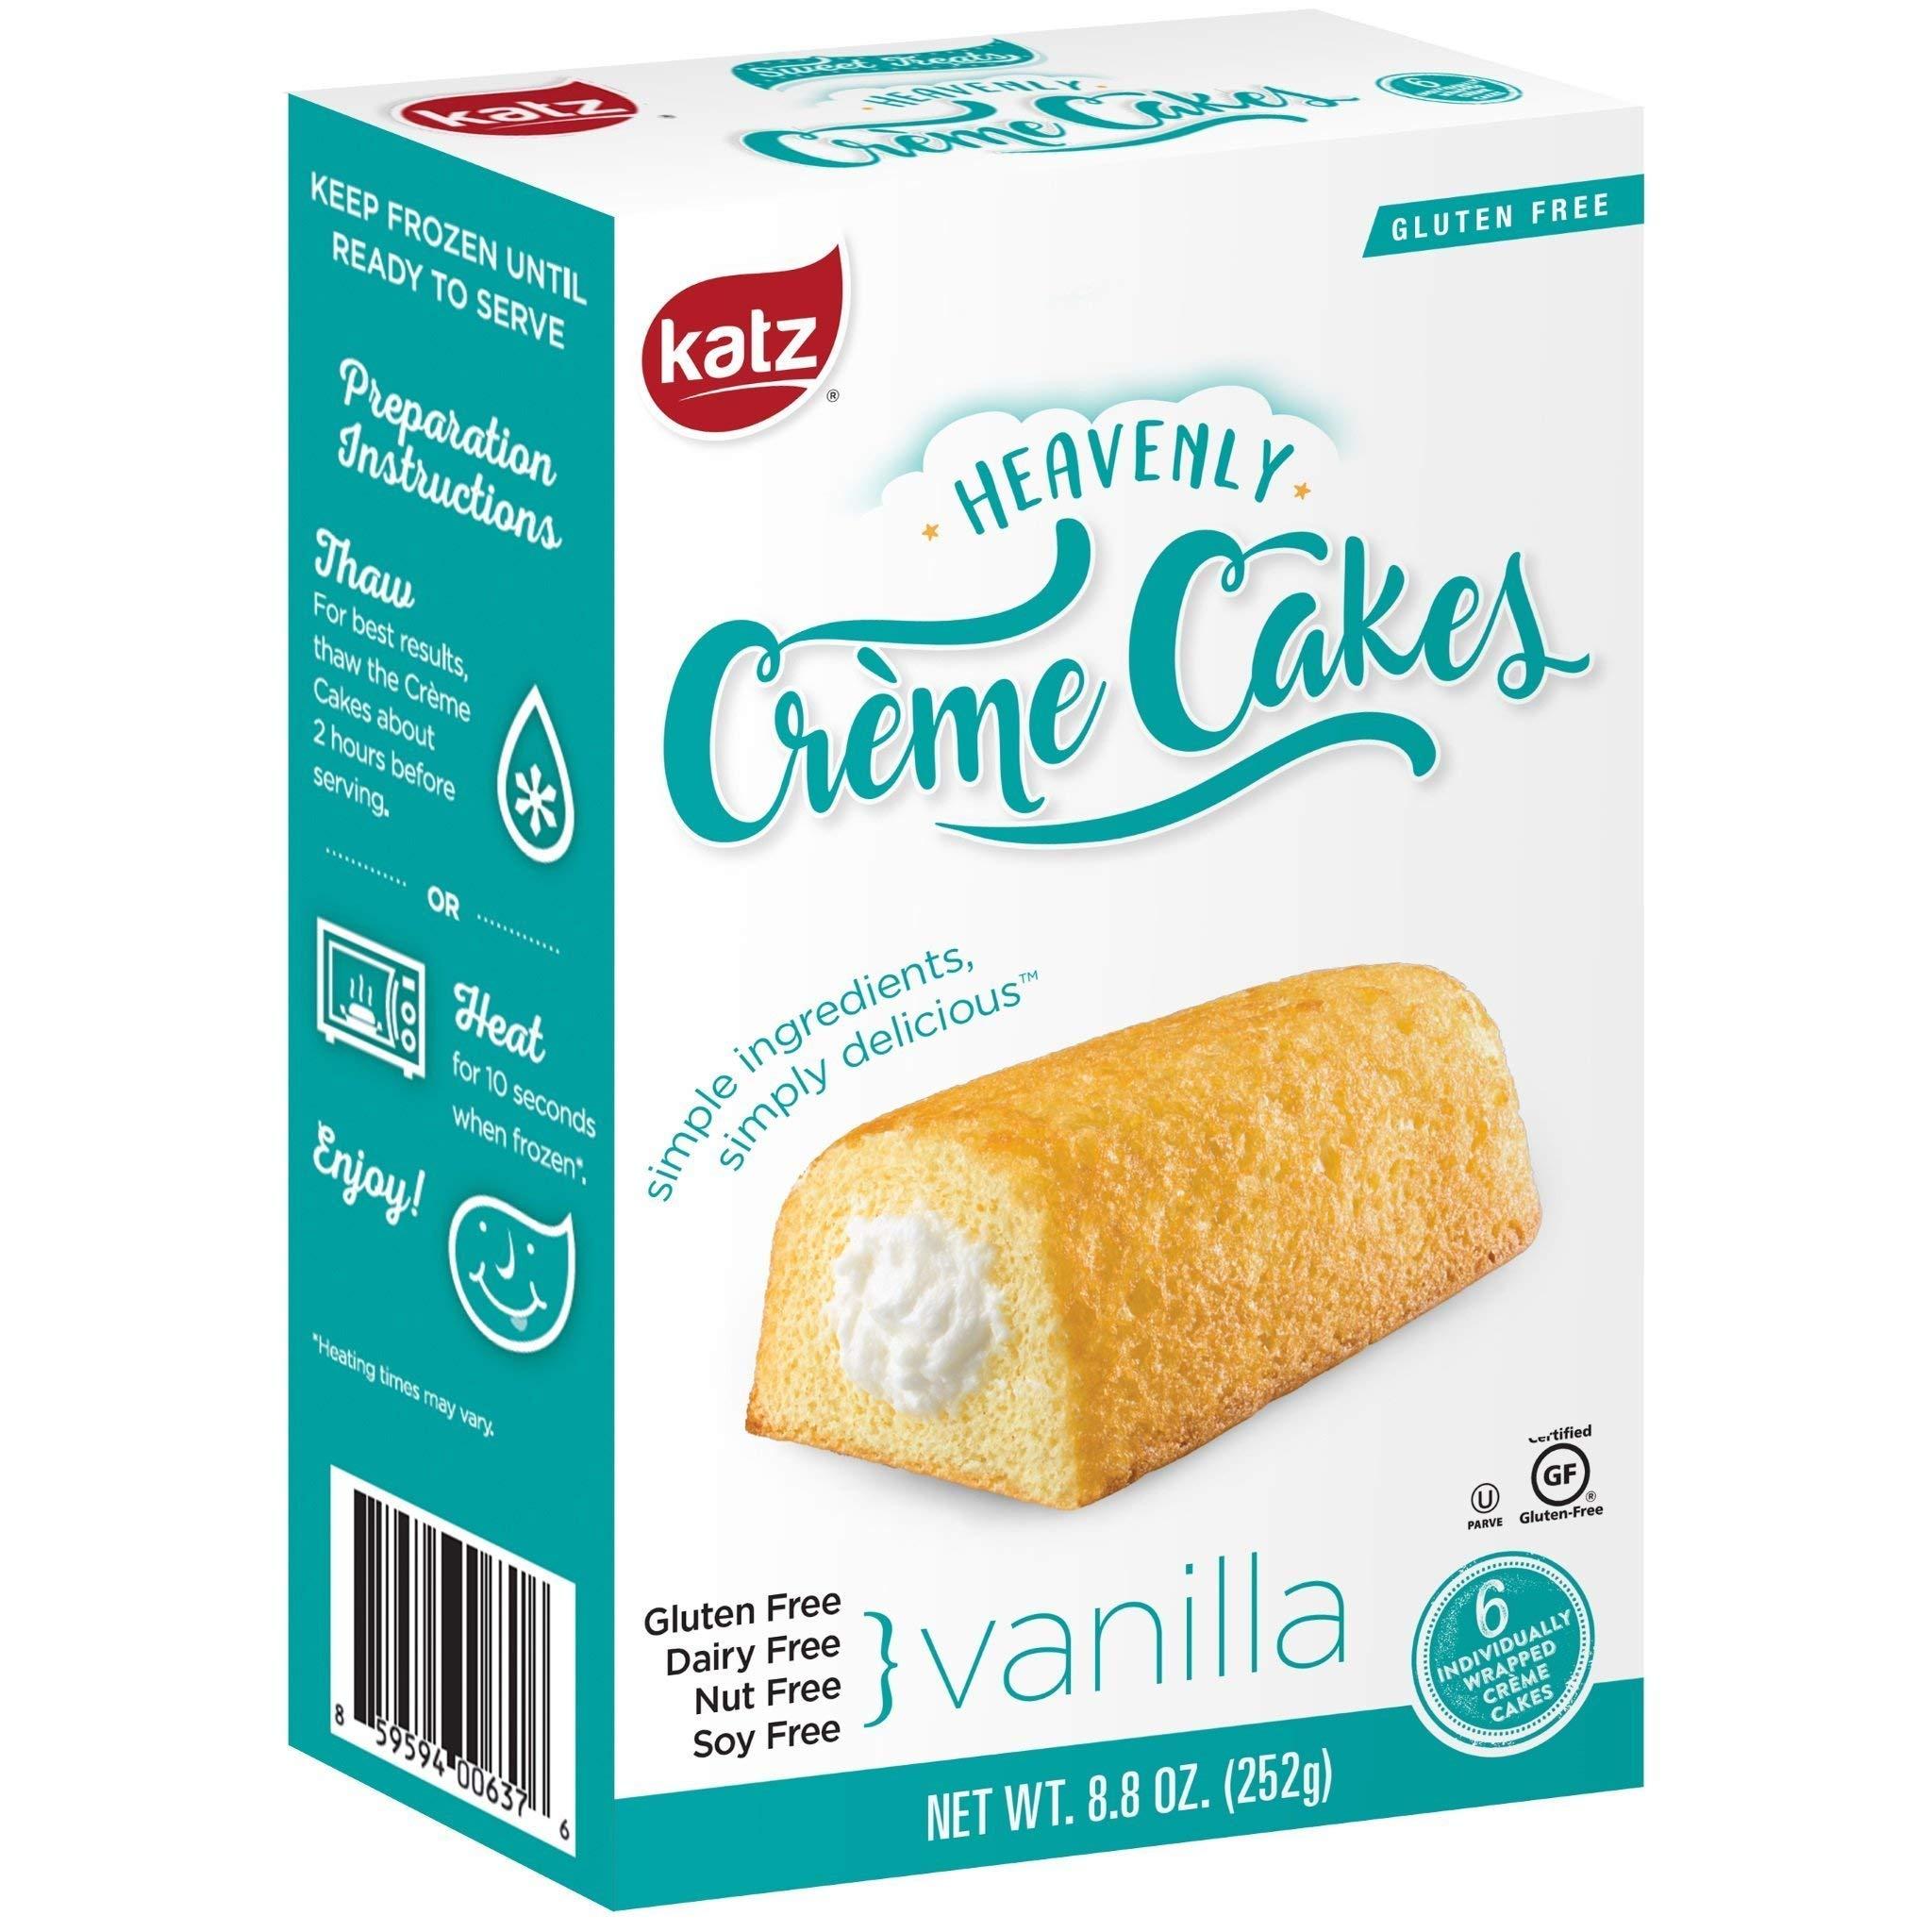 Katz Gluten Free Vanilla Crème Cakes | Dairy, Nut, Soy and Gluten Free | Kosher (6 Packs of 6 Crème Cakes, 8.8 Ounce Each) by Katz Gluten Free